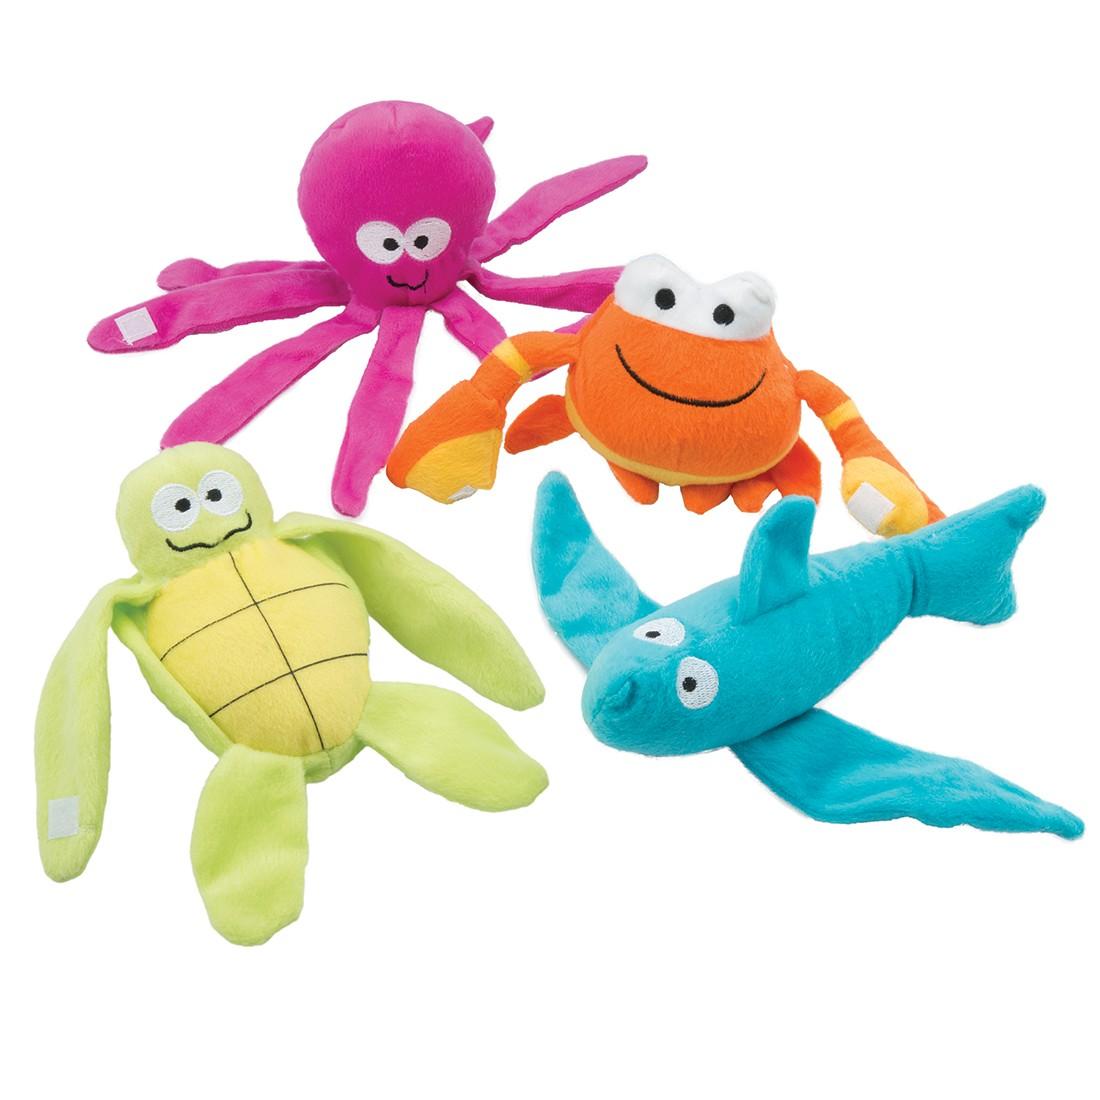 Plush Long Arm Sea Animals [image]